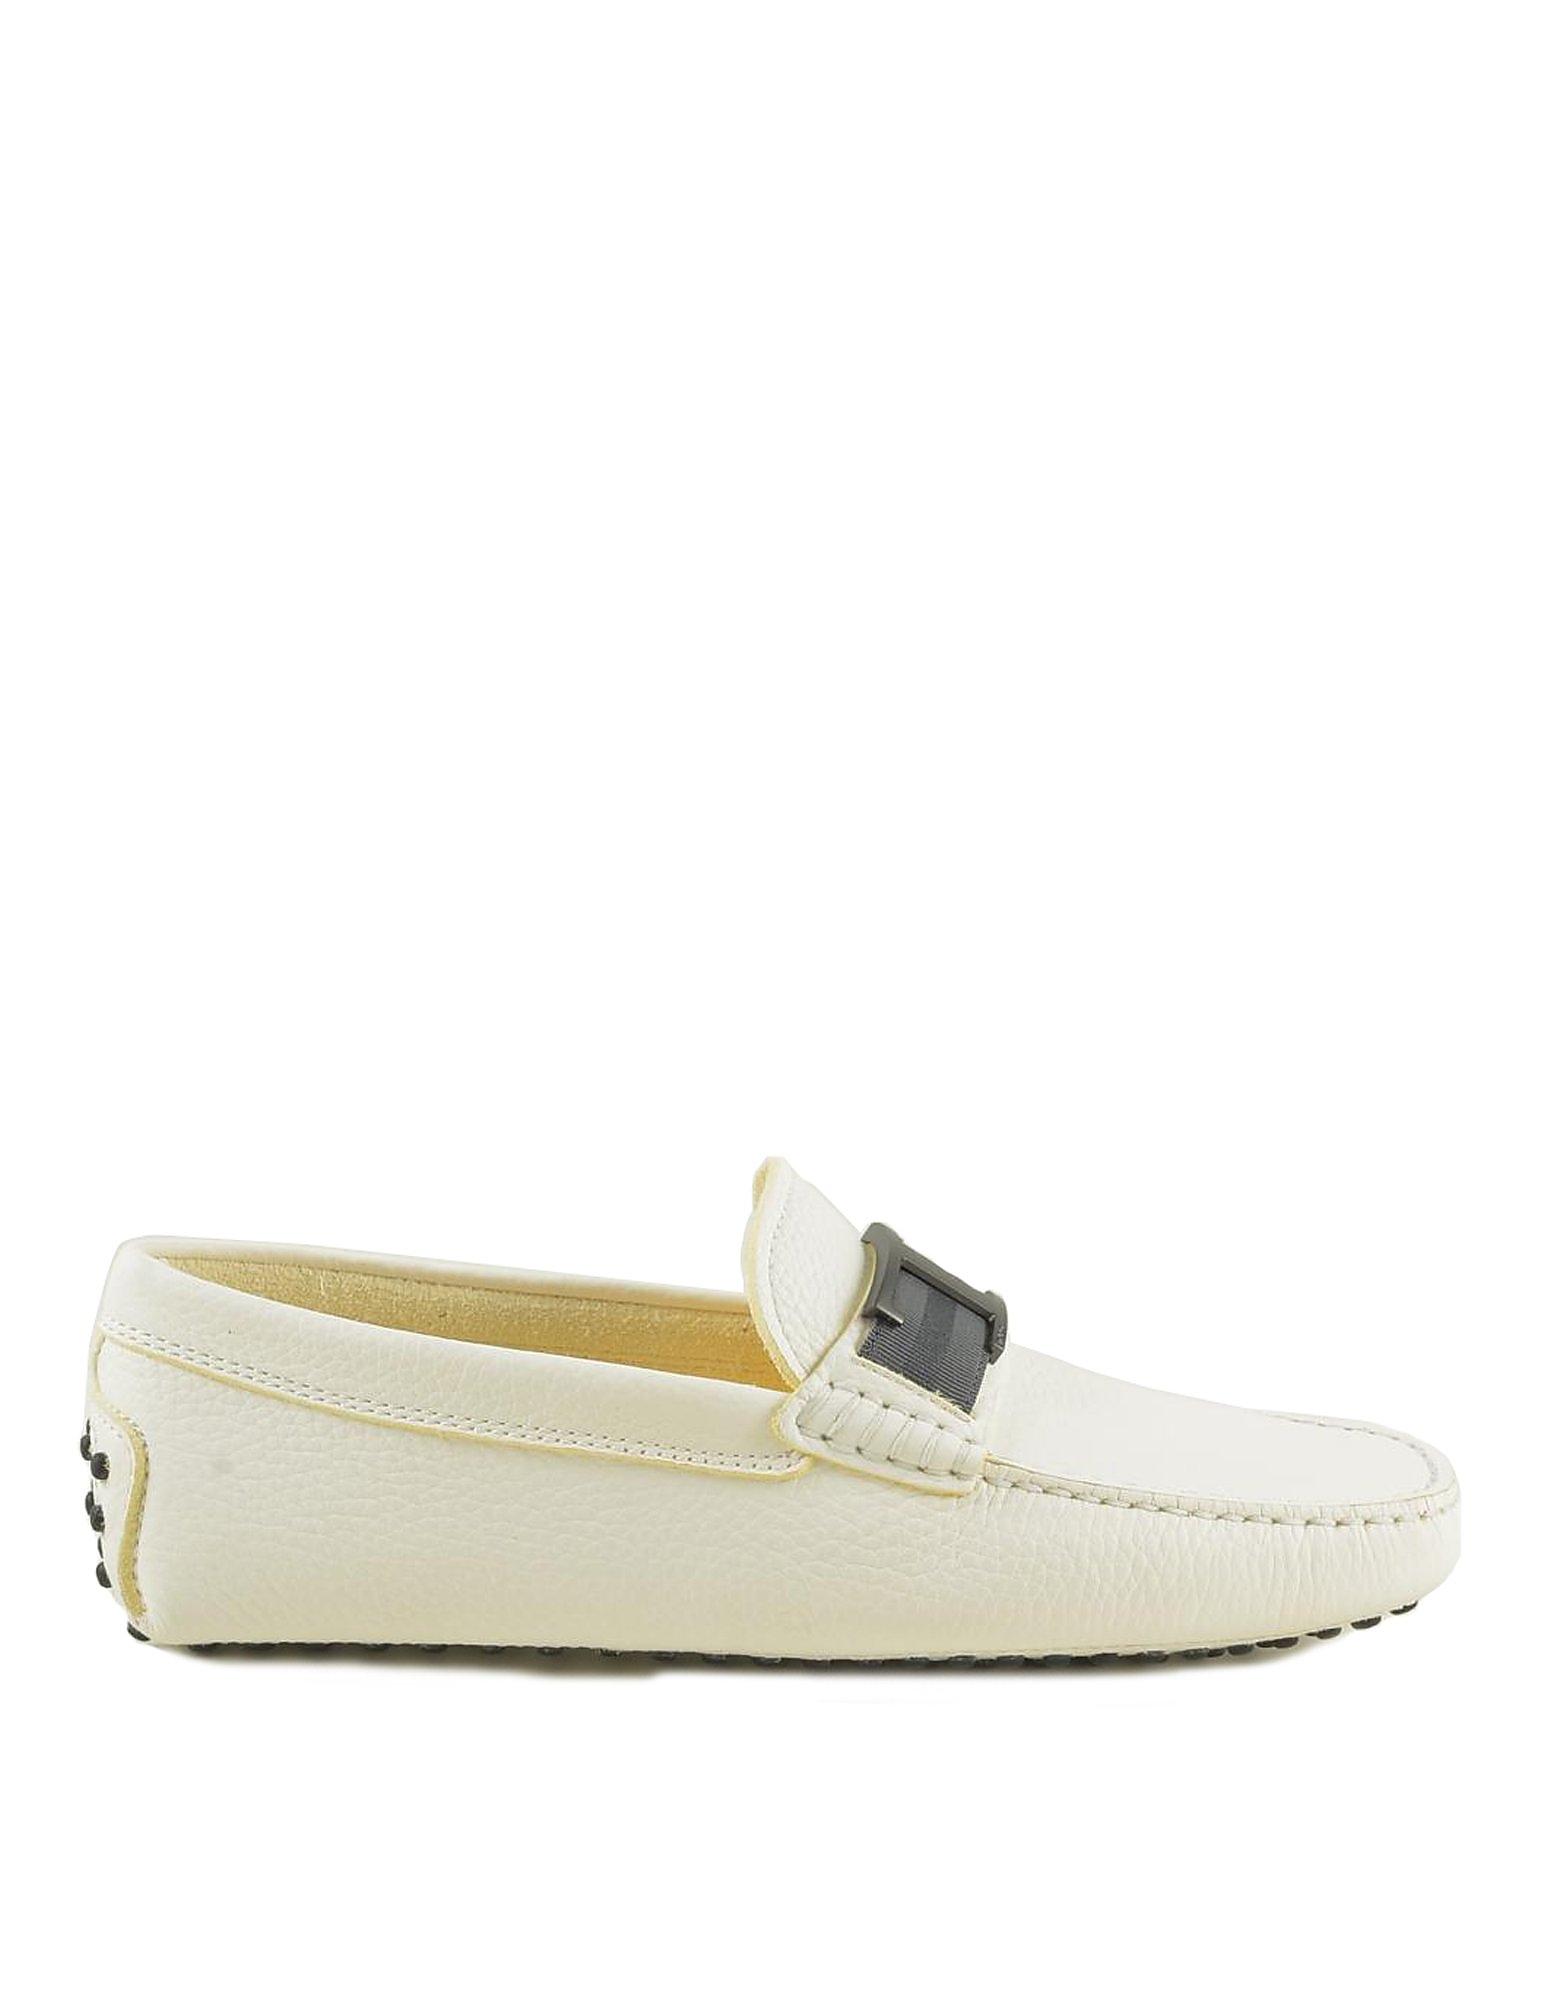 Tod's Designer Shoes, Men's White Loafer Shoes